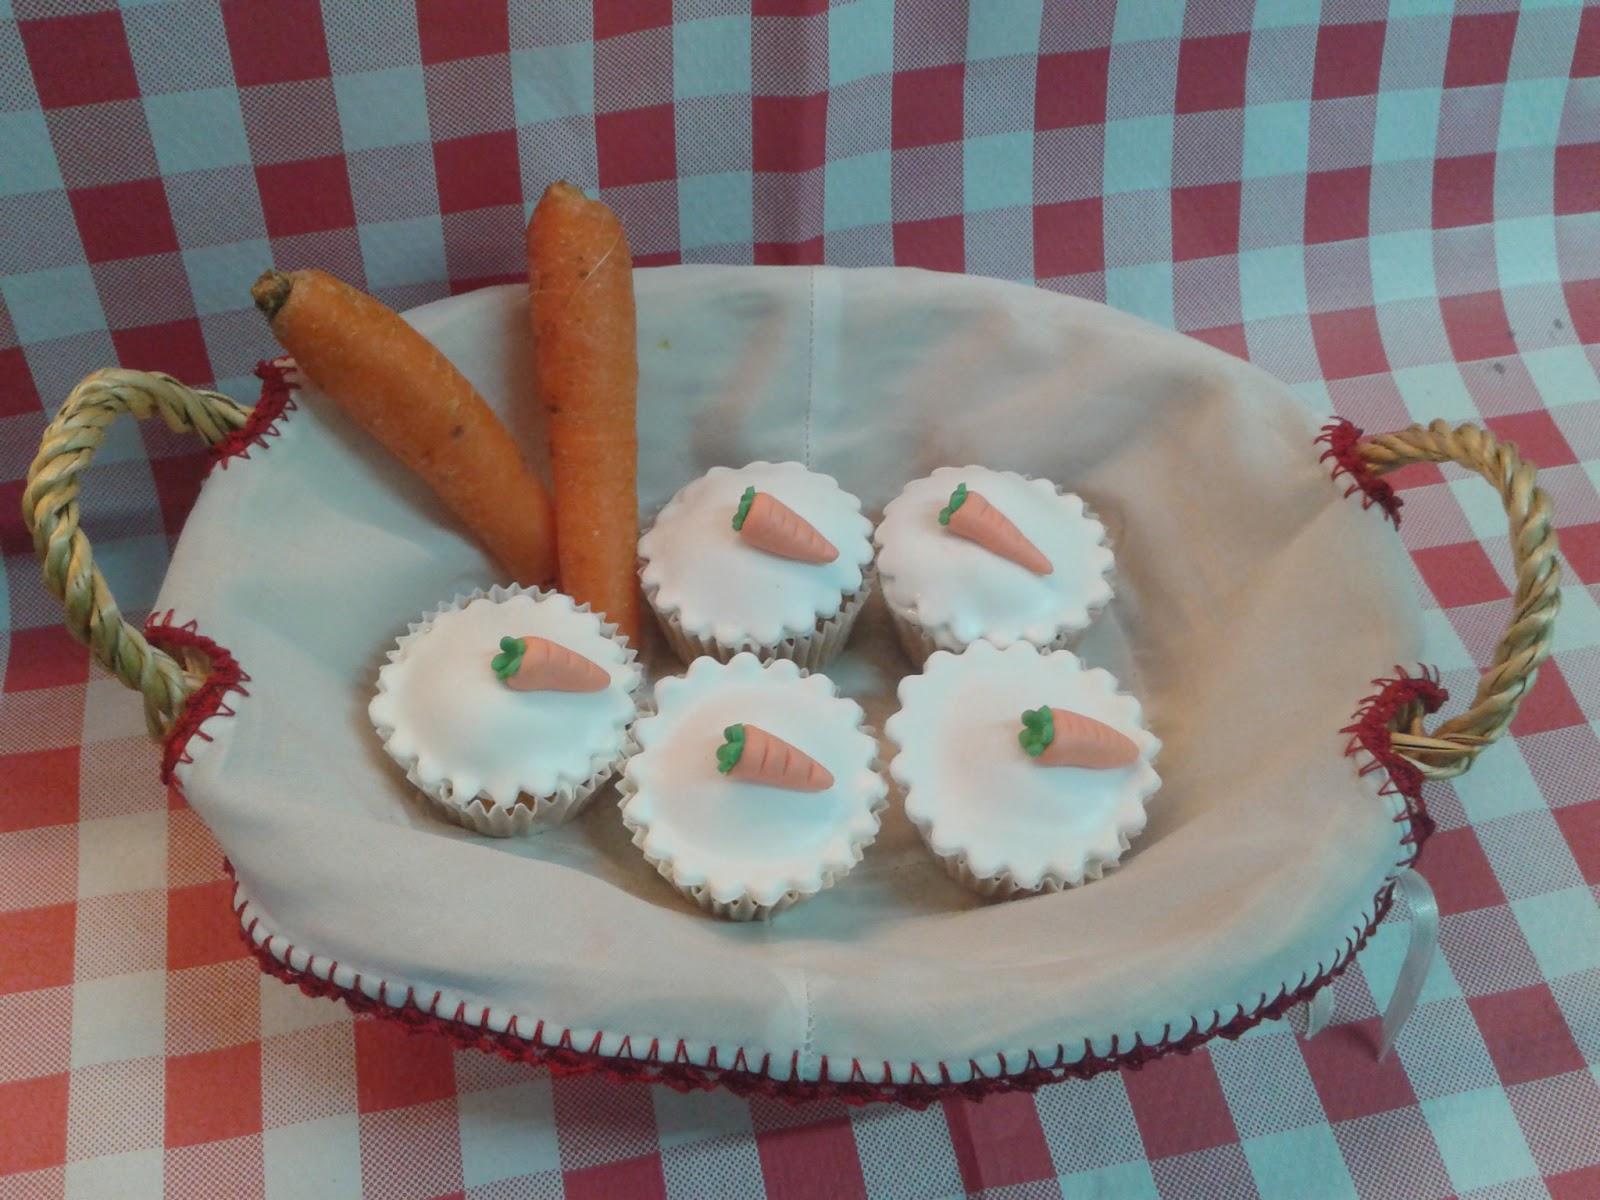 Cupcakes tenerife cupcakes de zanahoria y naranja - Cupcakes tenerife ...